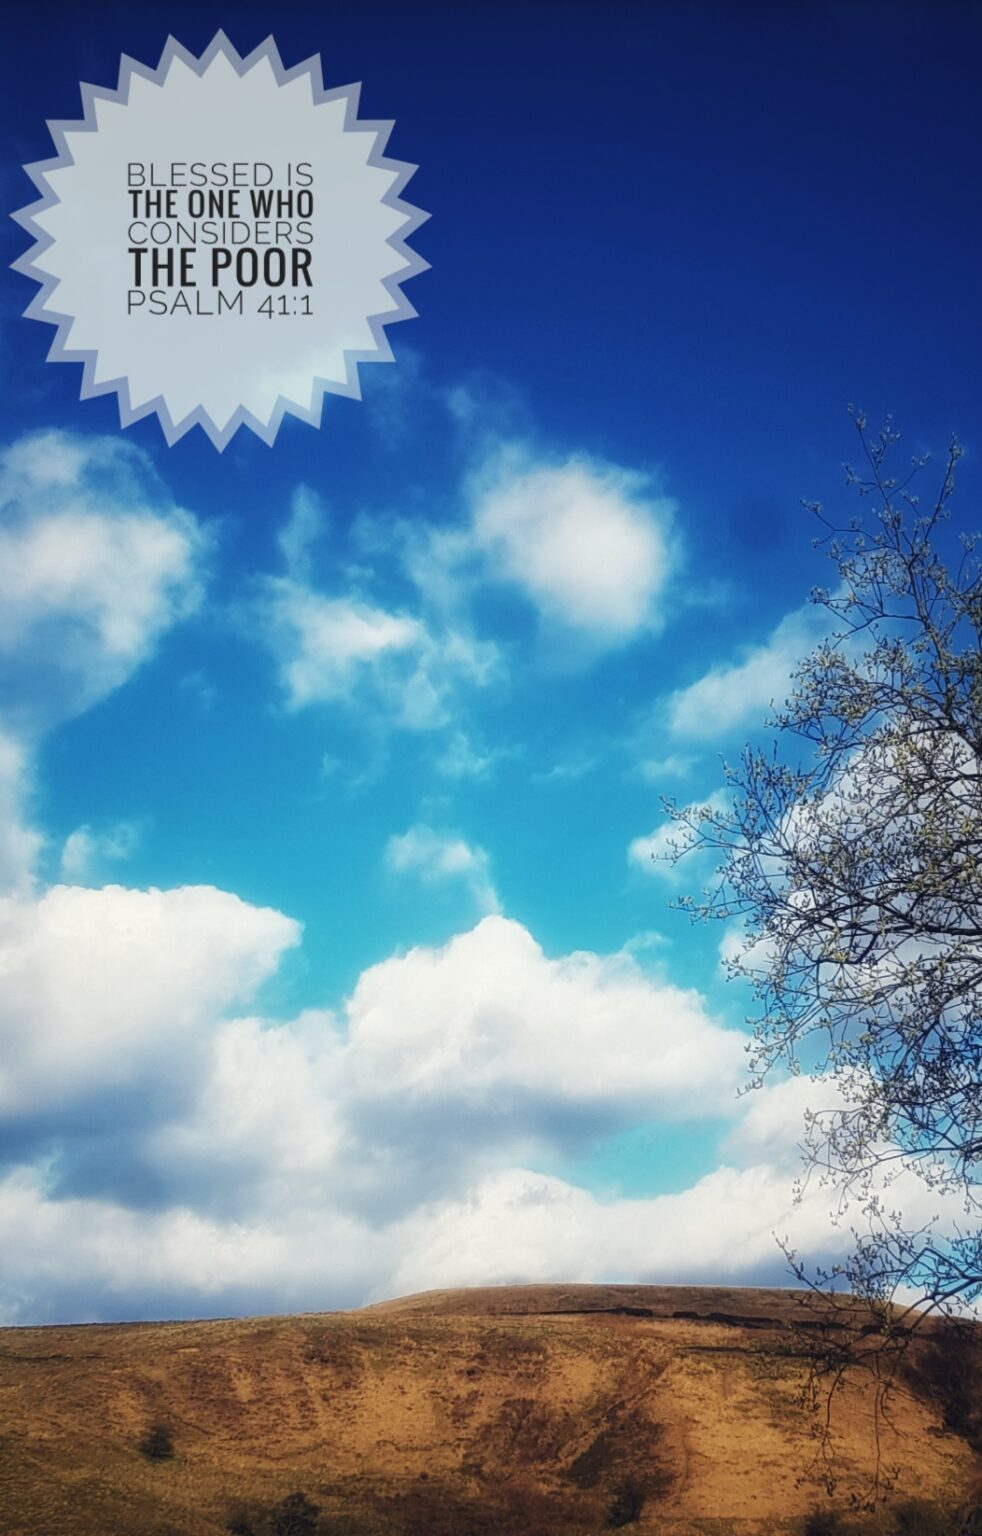 Summit, Littleborough - Psalm 41